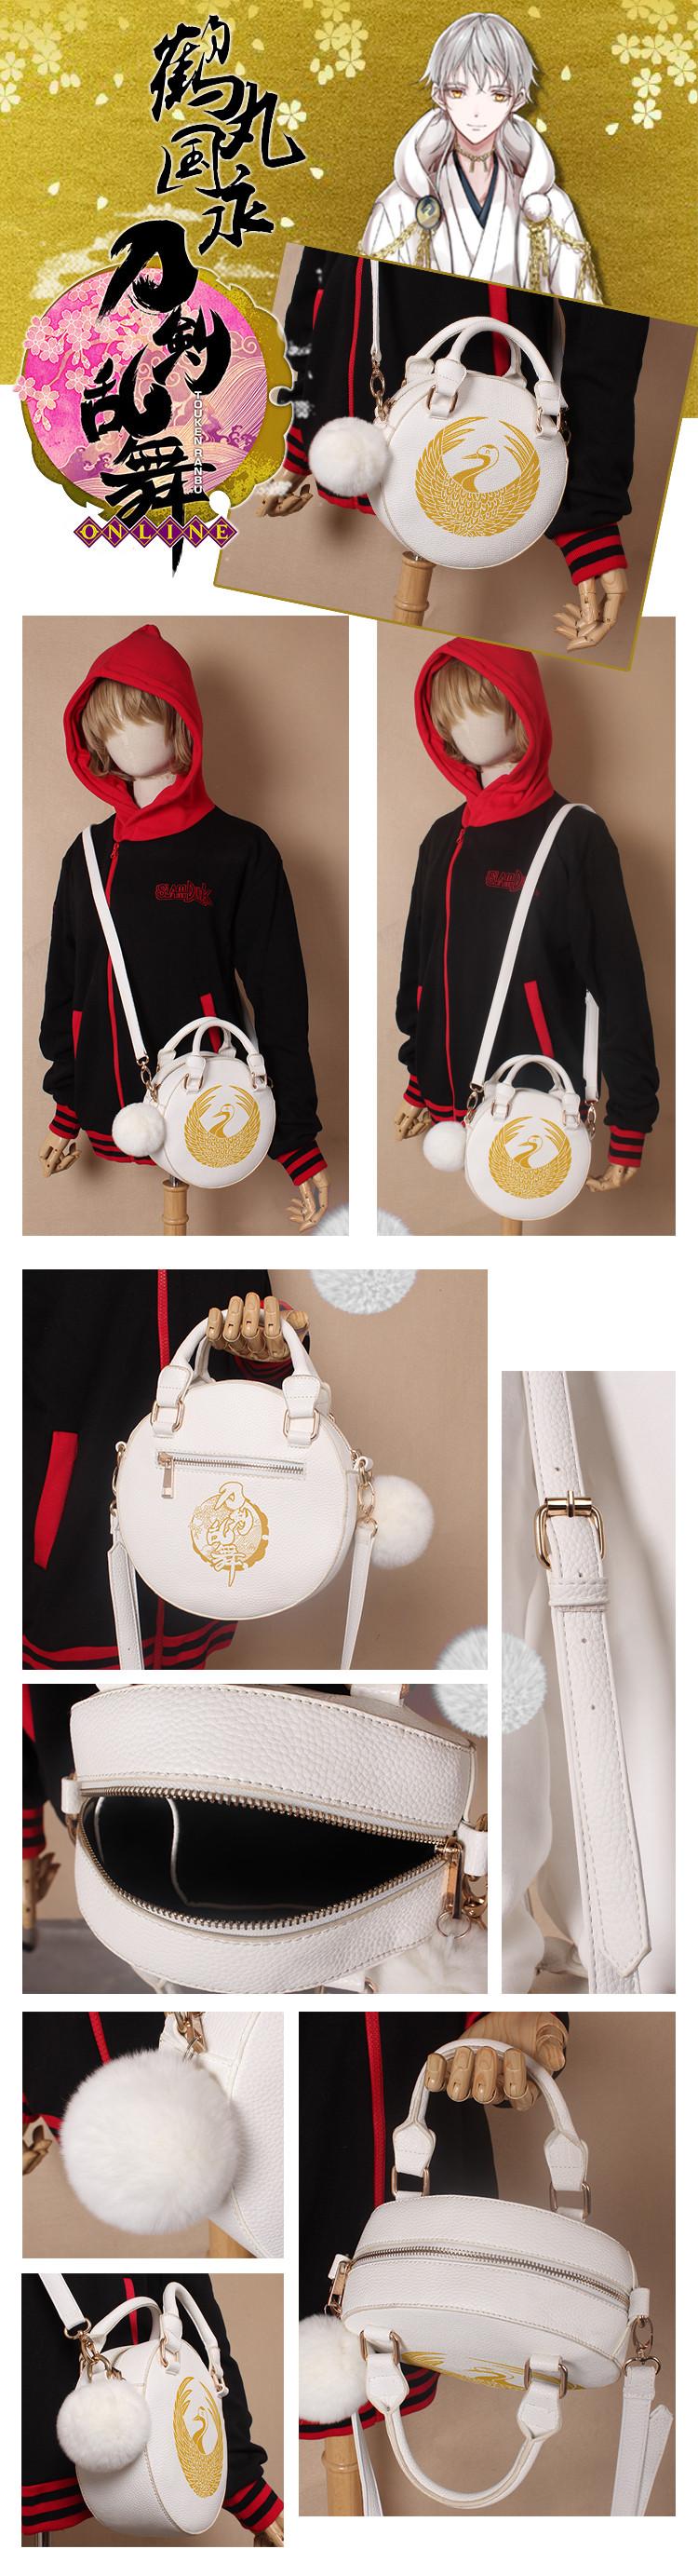 Touken Ranbu Tsurumarukuninaga Cosplay Bags Japan Anime Cartoon PU Shoulder Bag Women Cute Handbag Messenger Bags